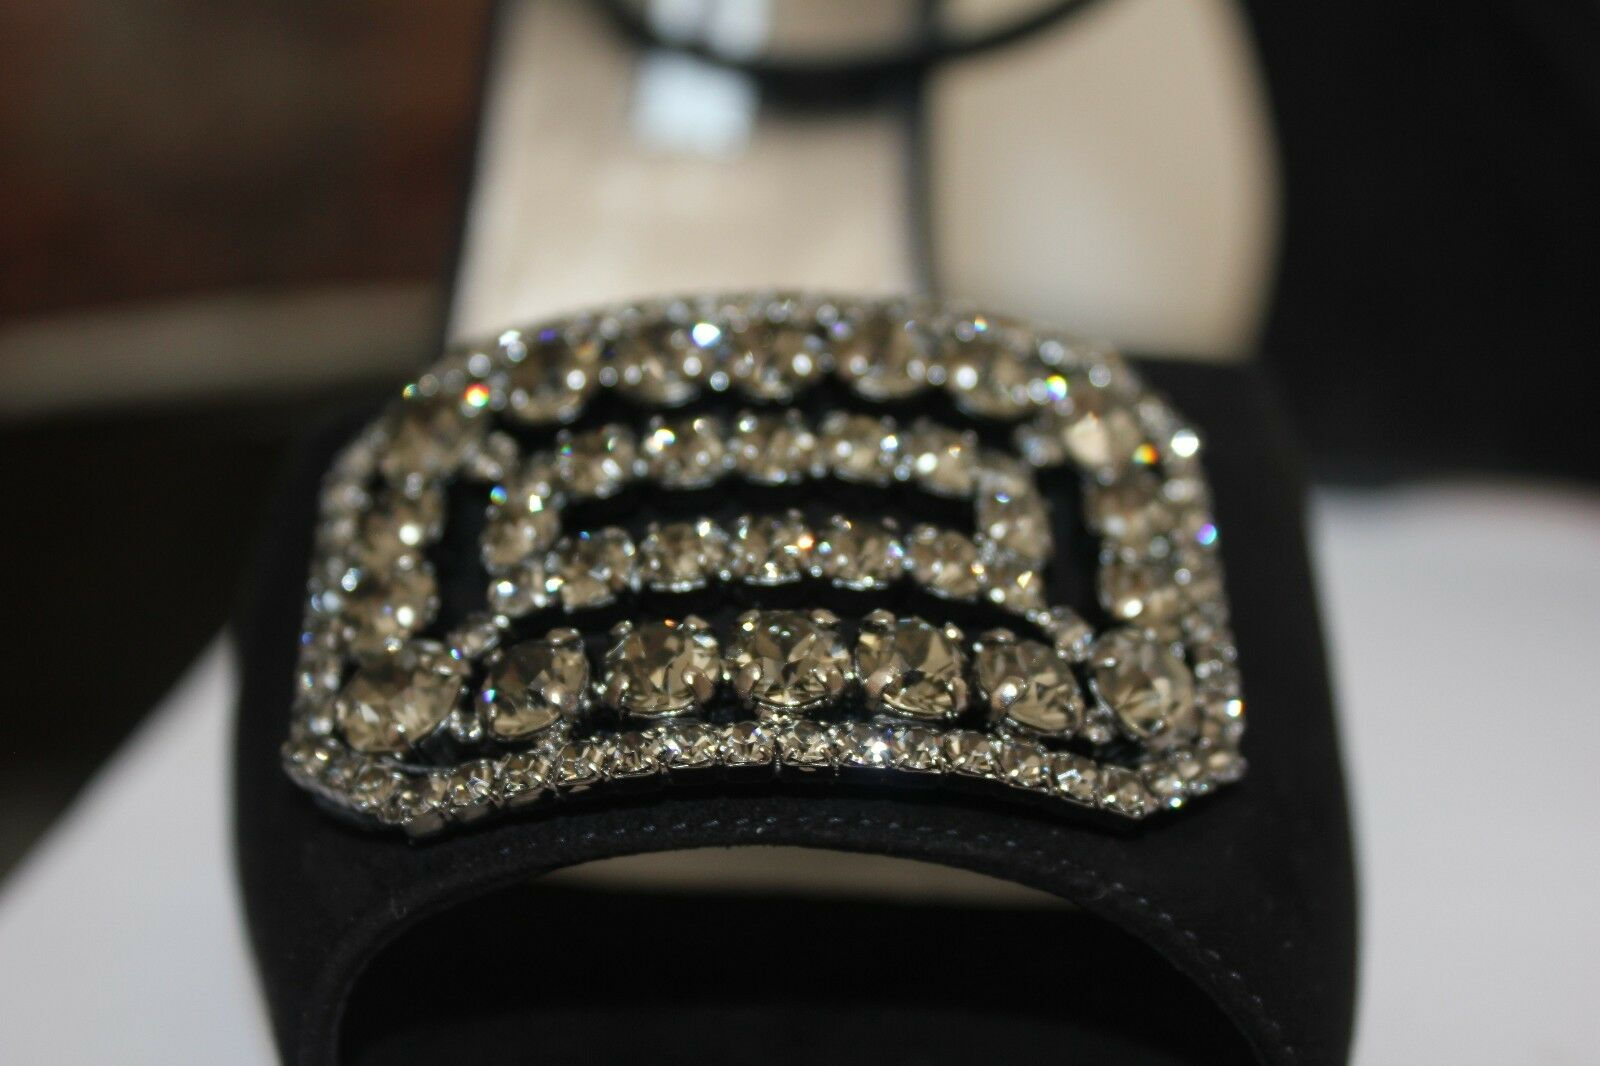 Manolo Blahnik Trice Trice Trice Wedge Black Suede Ankle Strap shoes Swarovski Buckle 41.5 71970c